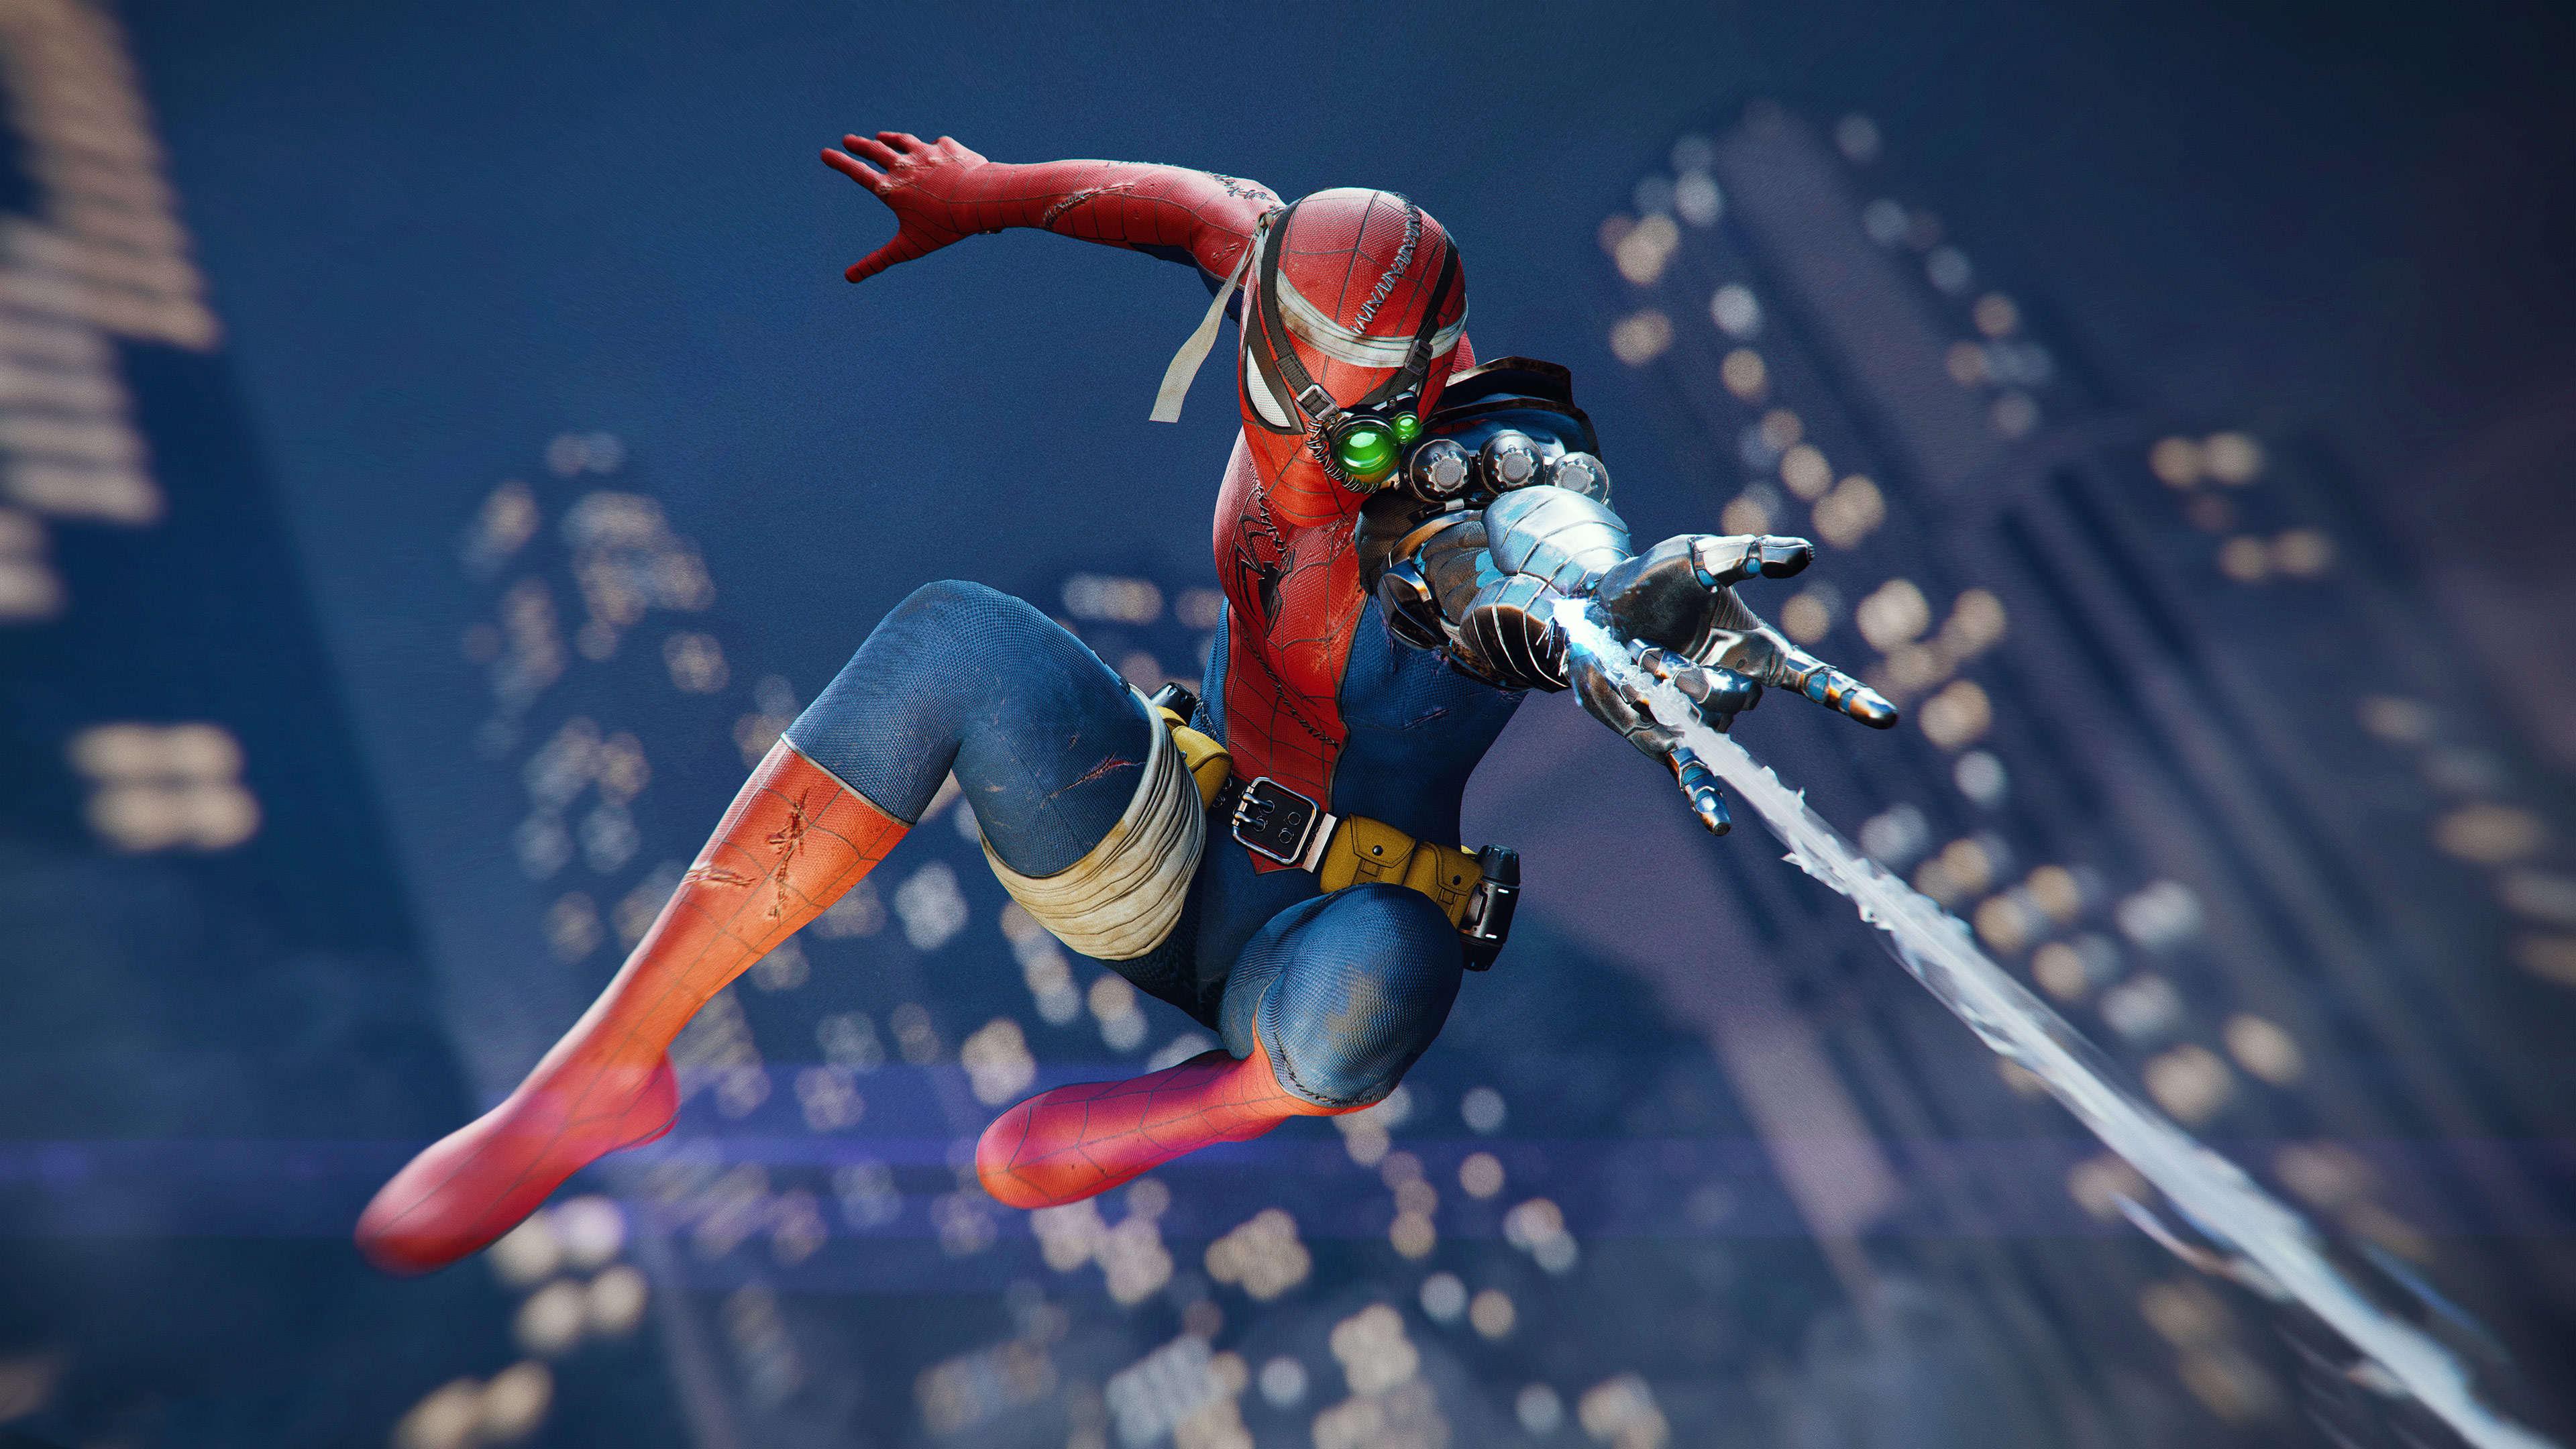 Spiderman Dlc Cyborg 4k, HD Games, 4k Wallpapers, Images ...